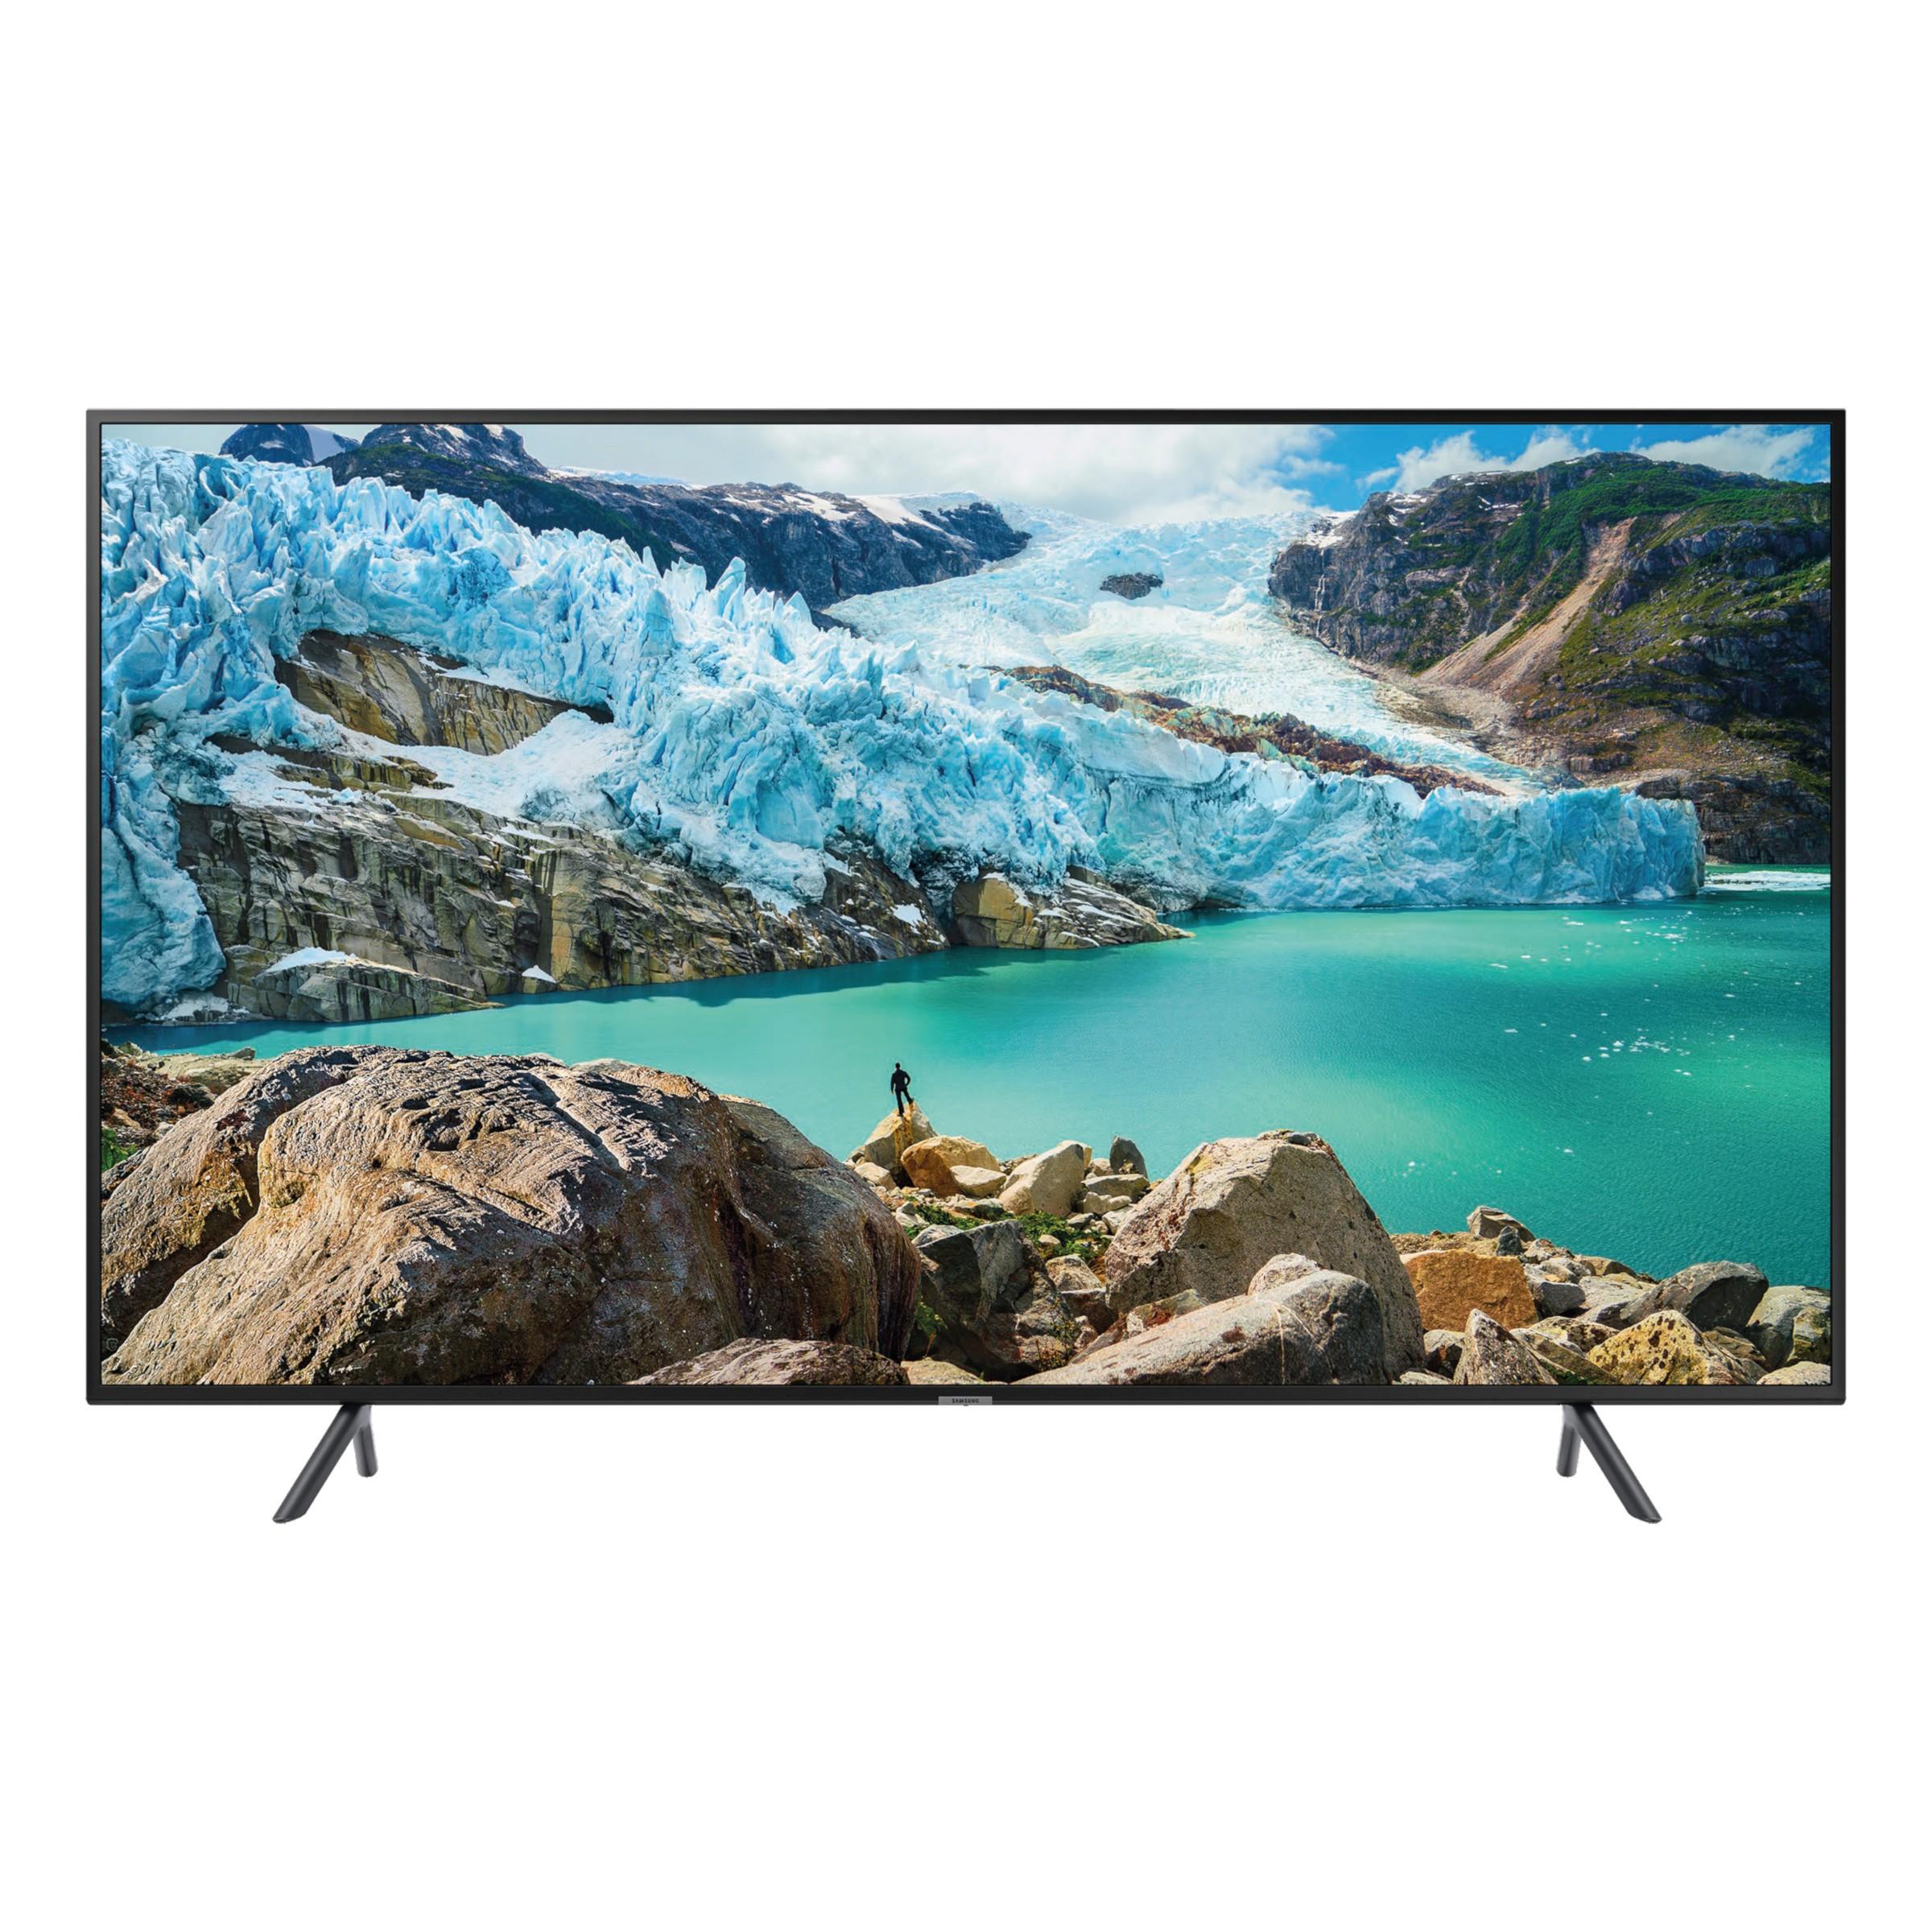 "Tv 75"" Samsung Ue75ru7105 4k Smart Tv Wifi Hdmi Usb"